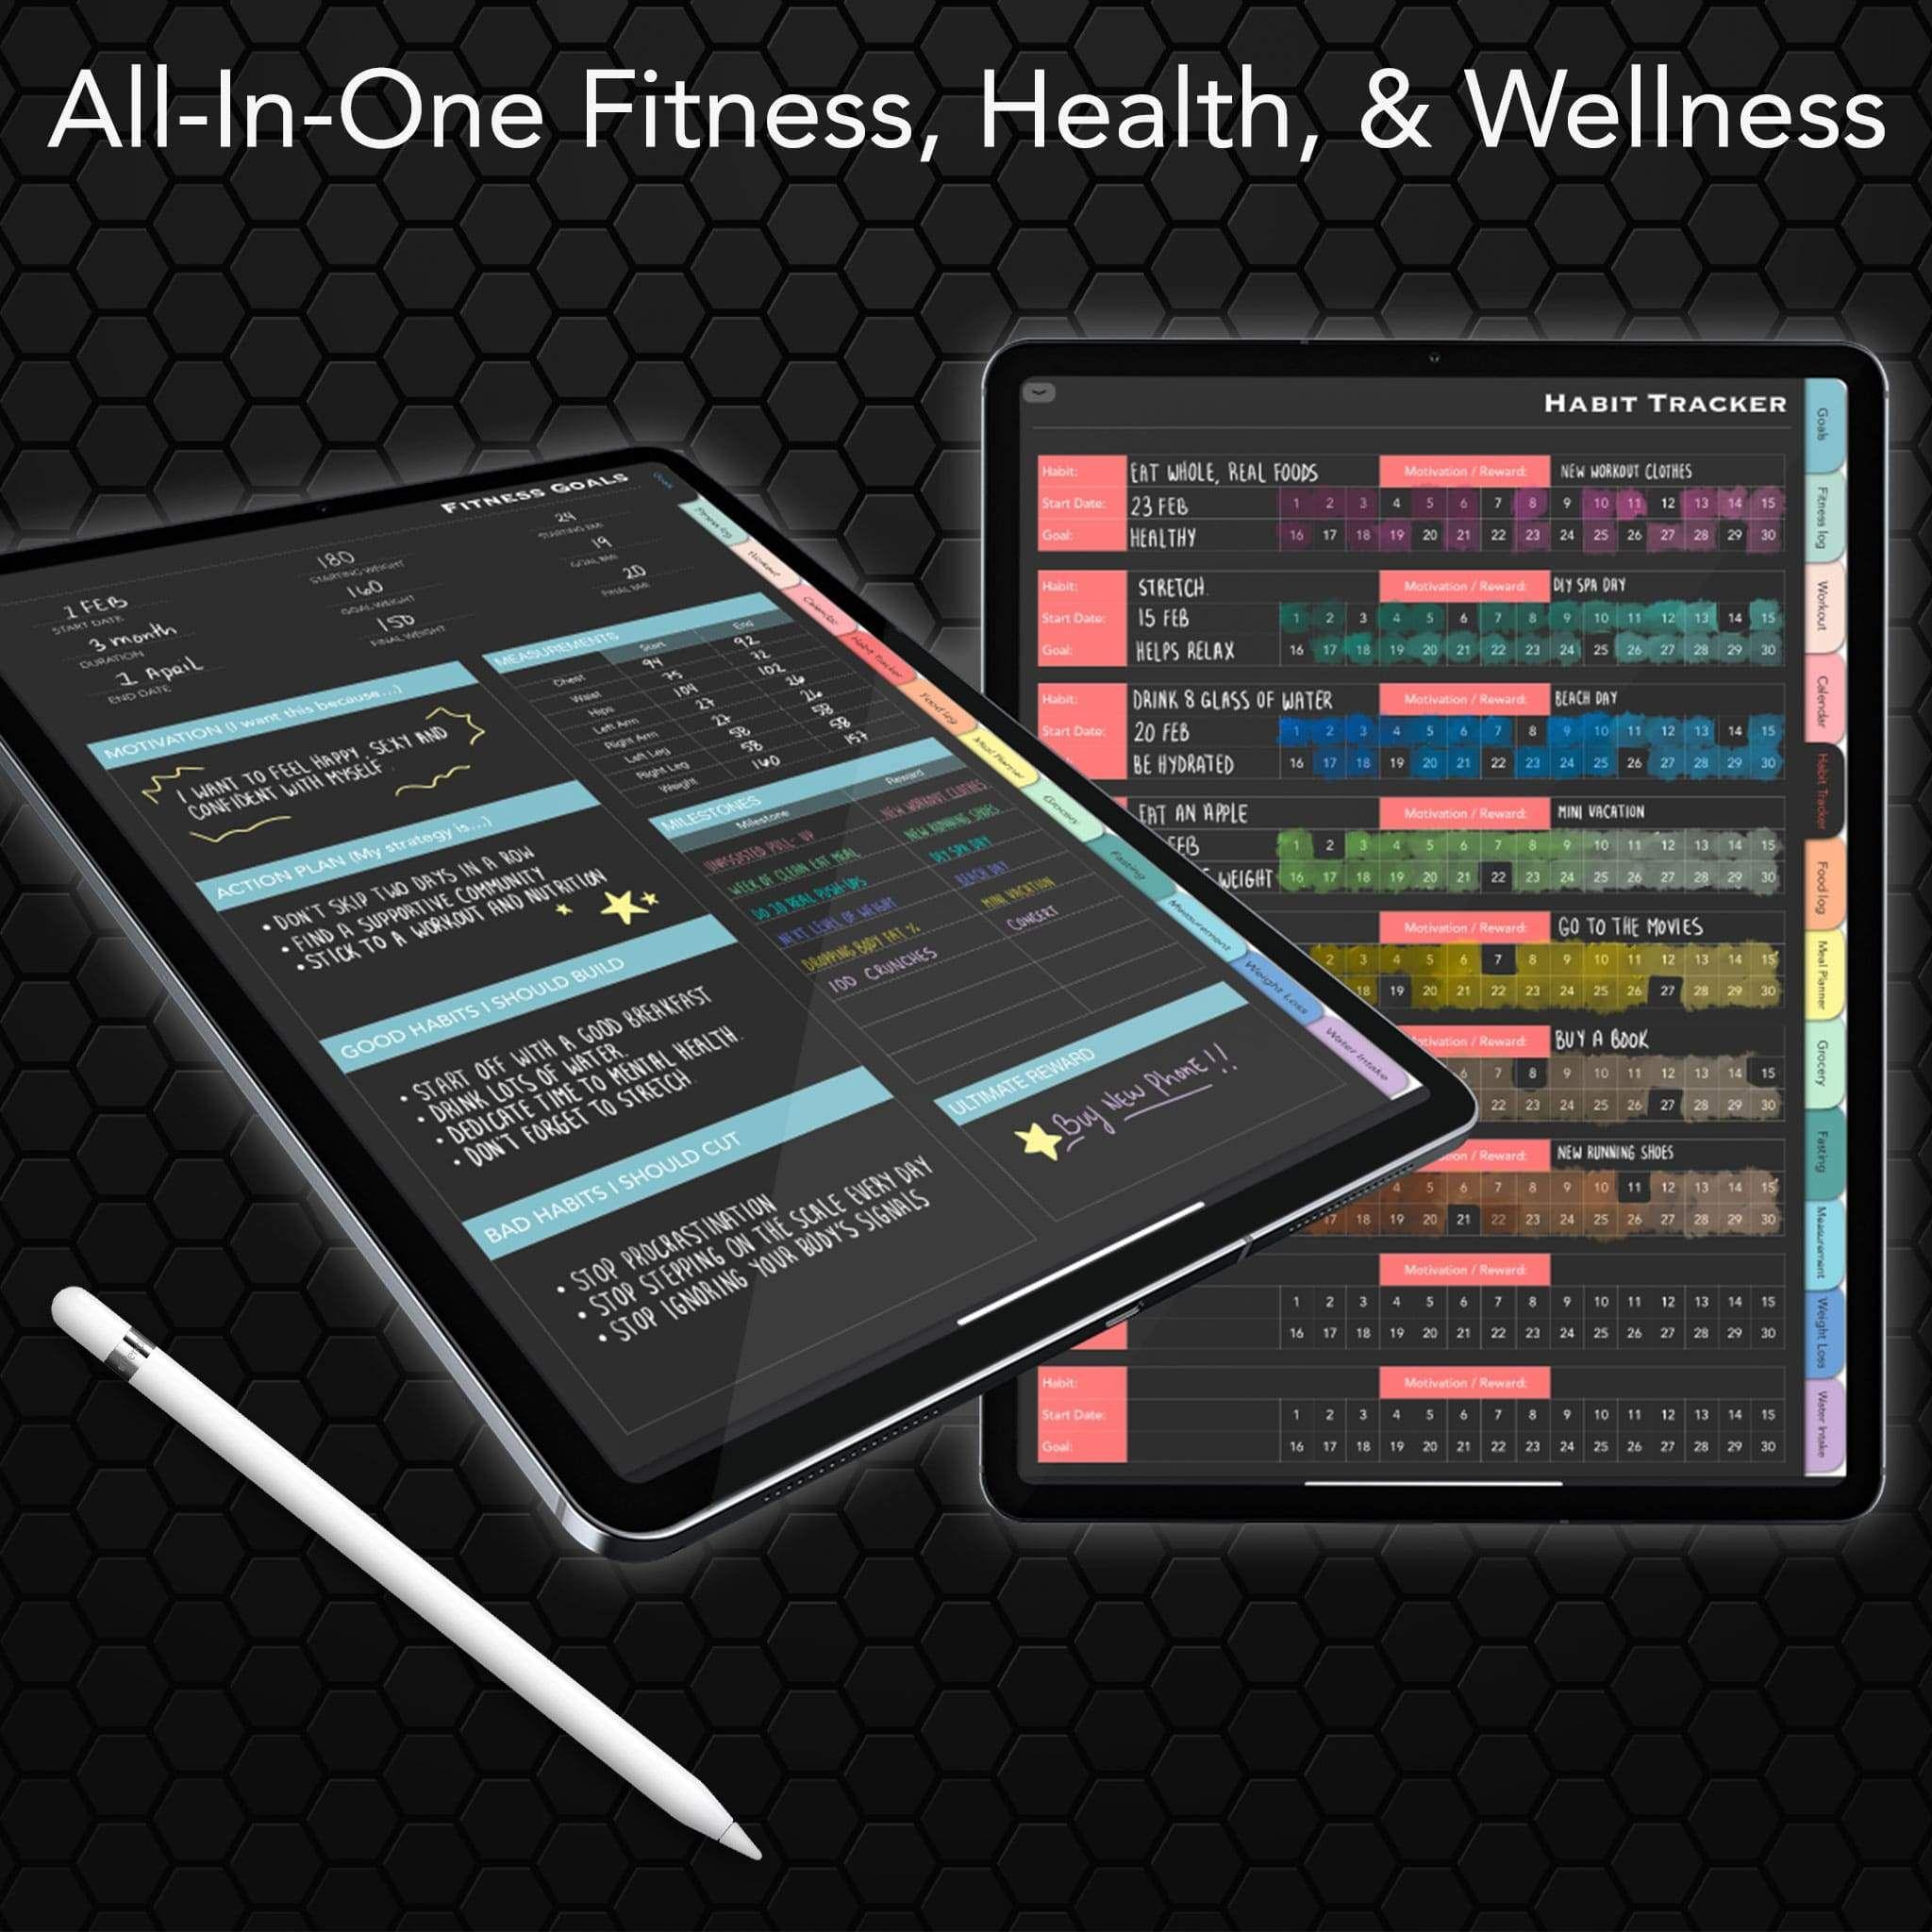 Dark Digital Health & Fitness Planner for Goodnotes, Notability or similar apps -   14 fitness Planner app ideas